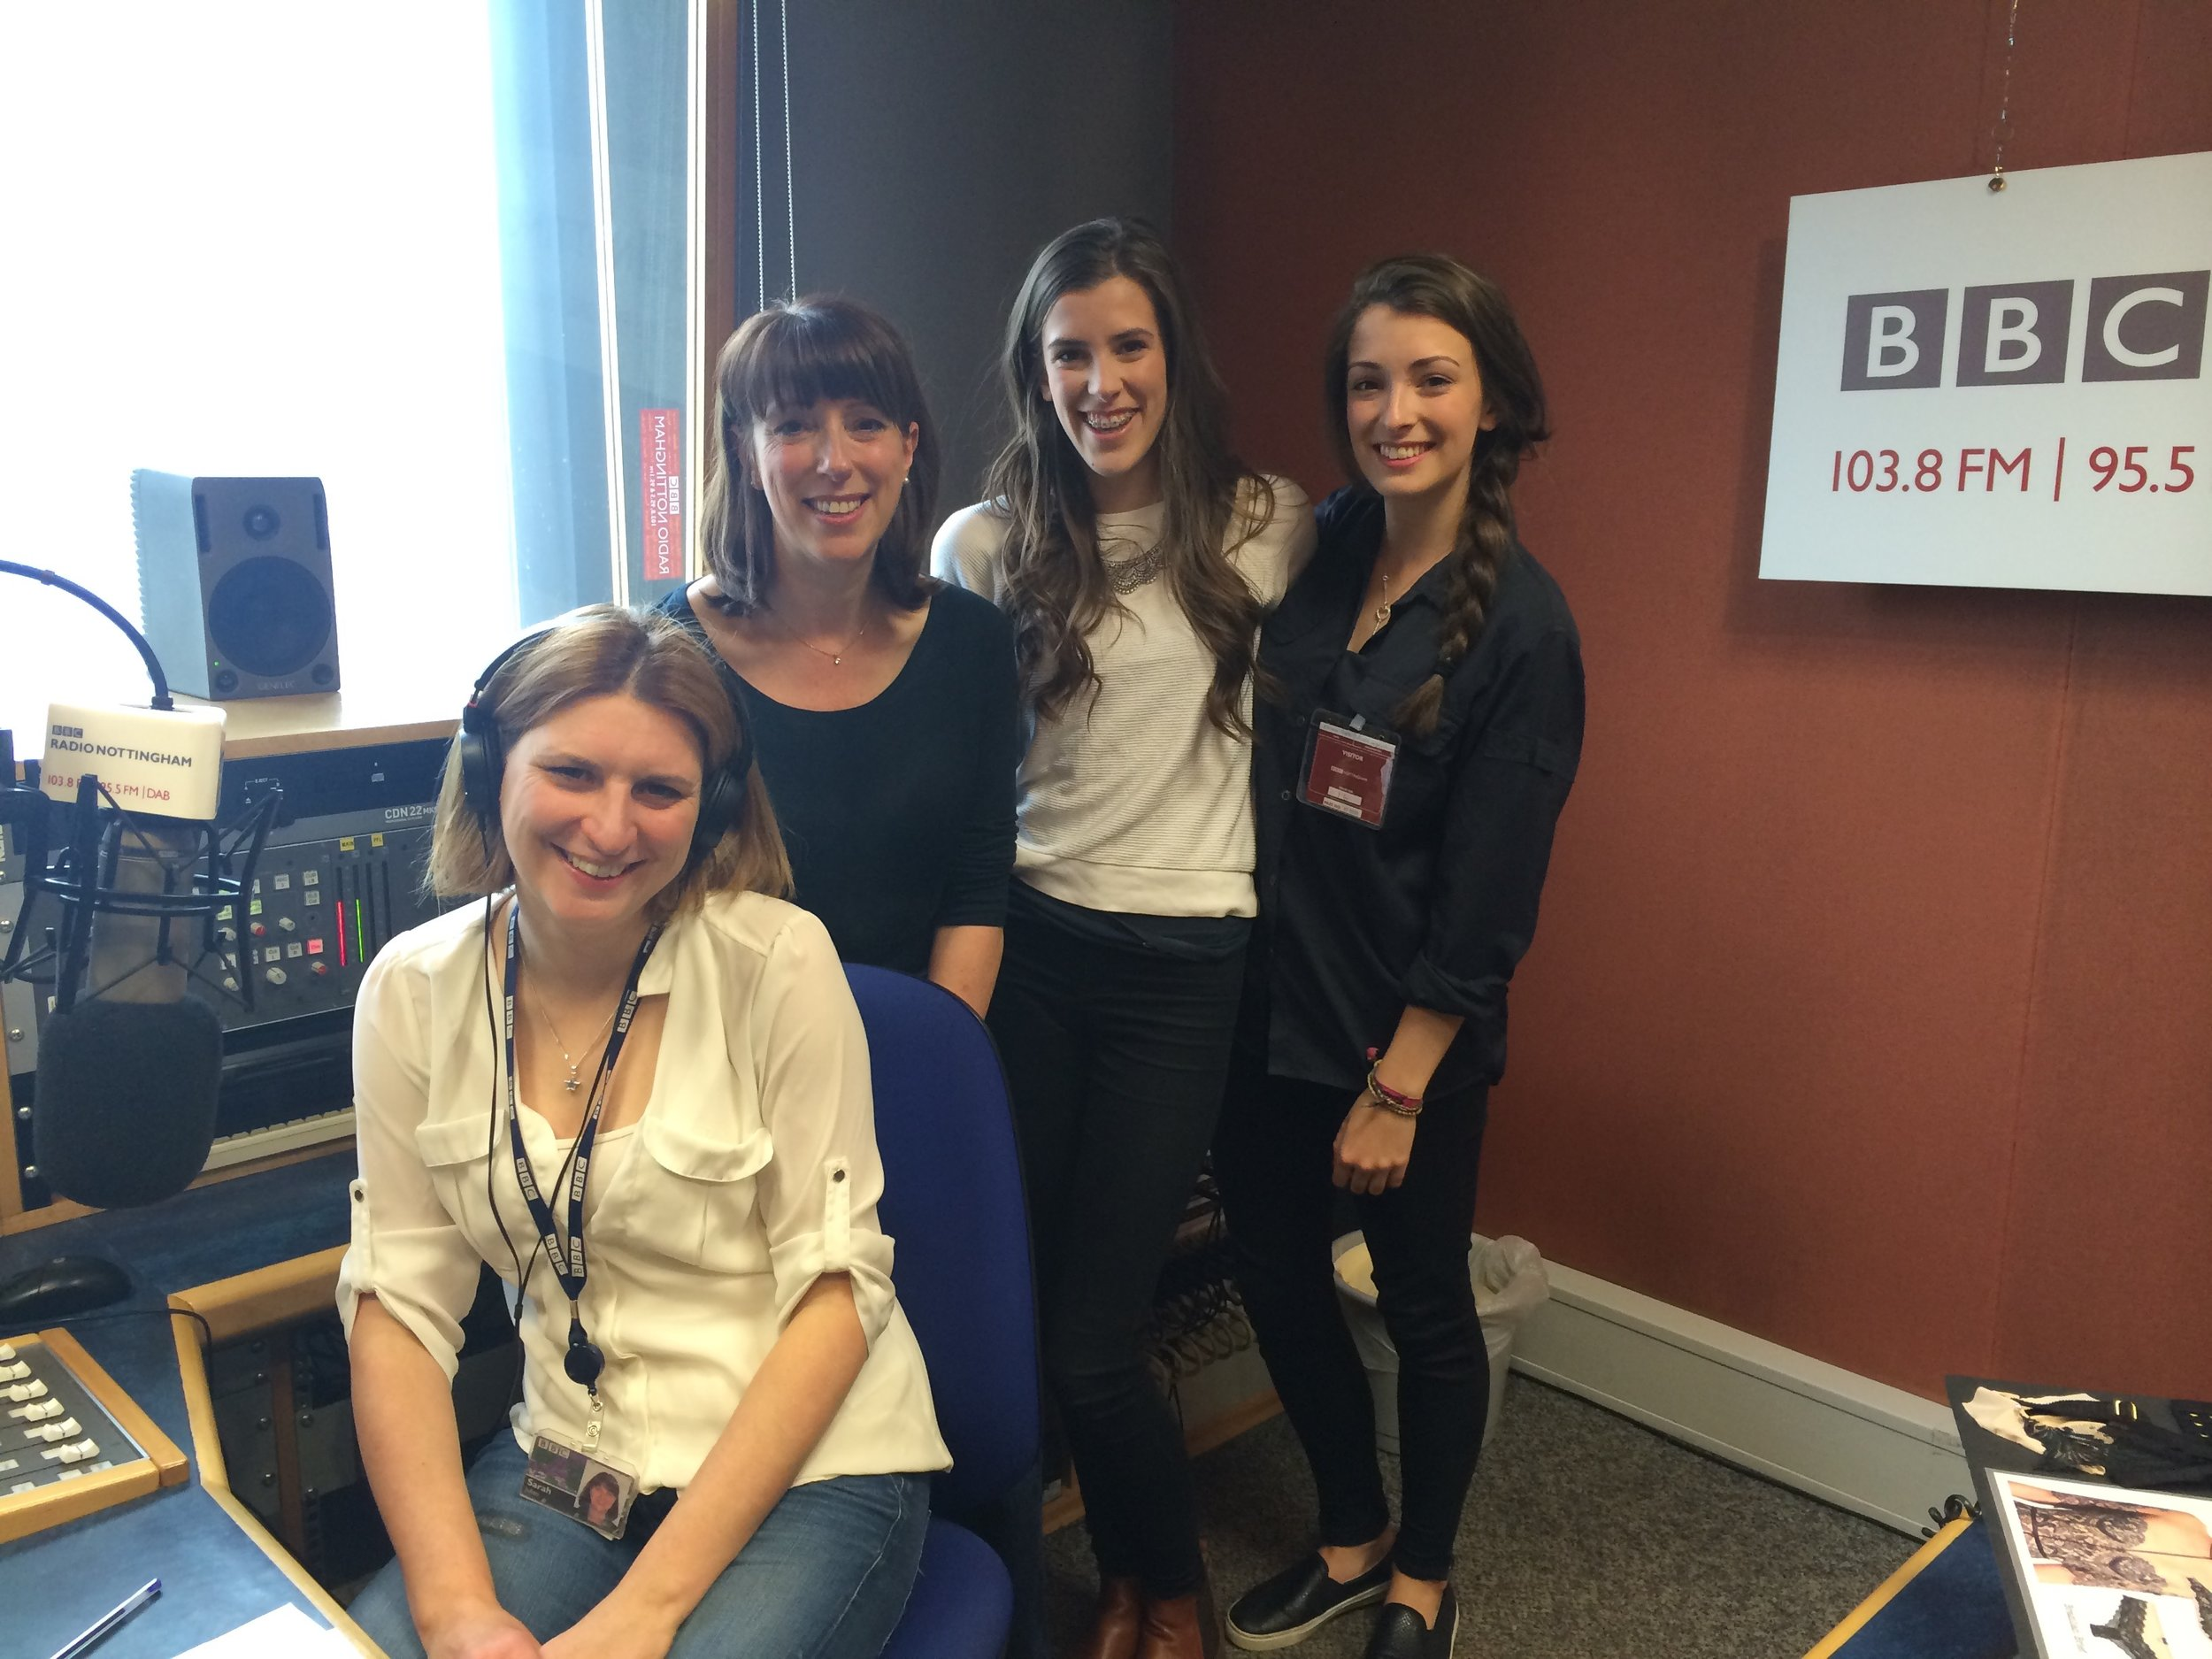 Team millie at BBC Radio Nottingham